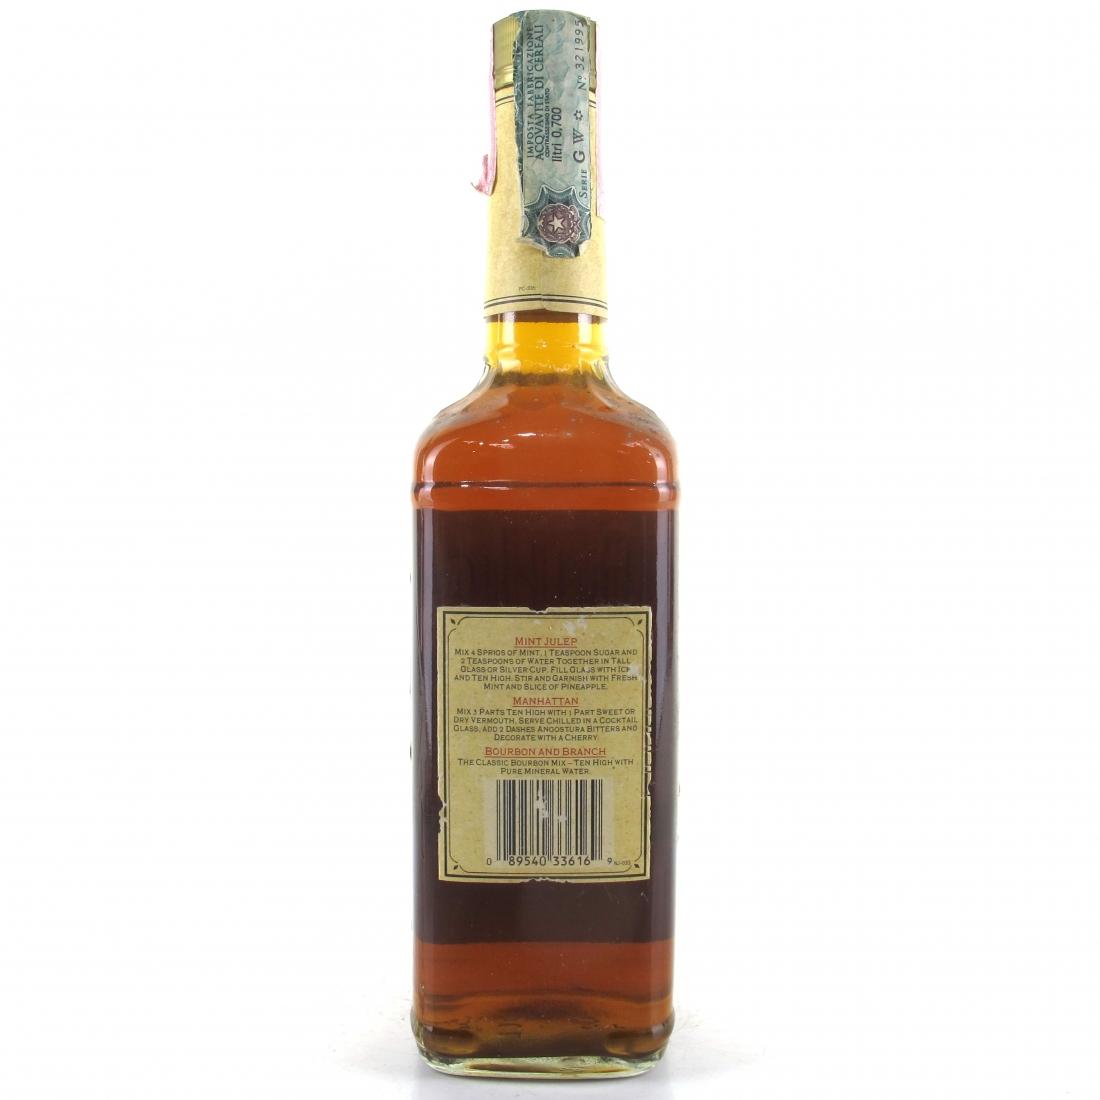 Ten High Kentucky Straight Bourbon Whiskey